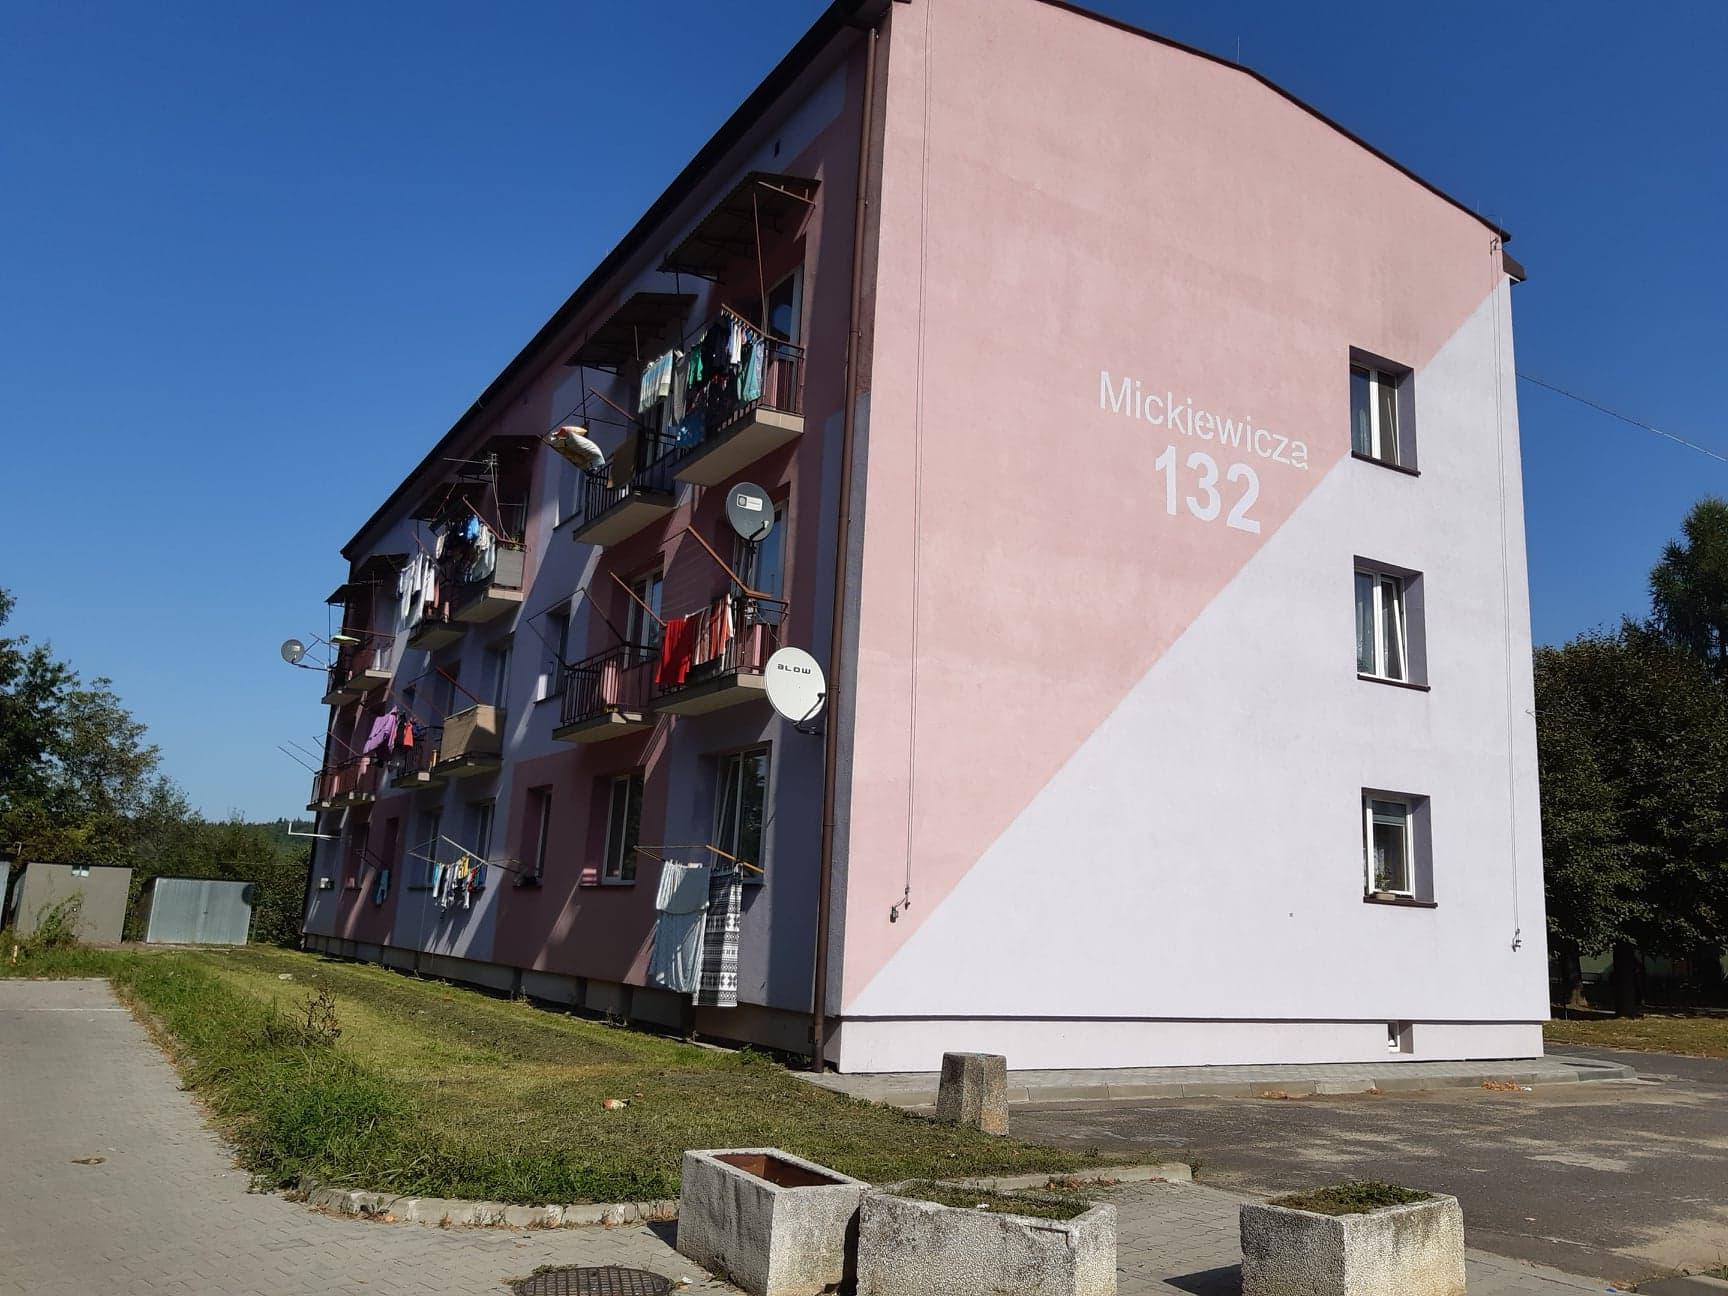 Mickiewicza 132